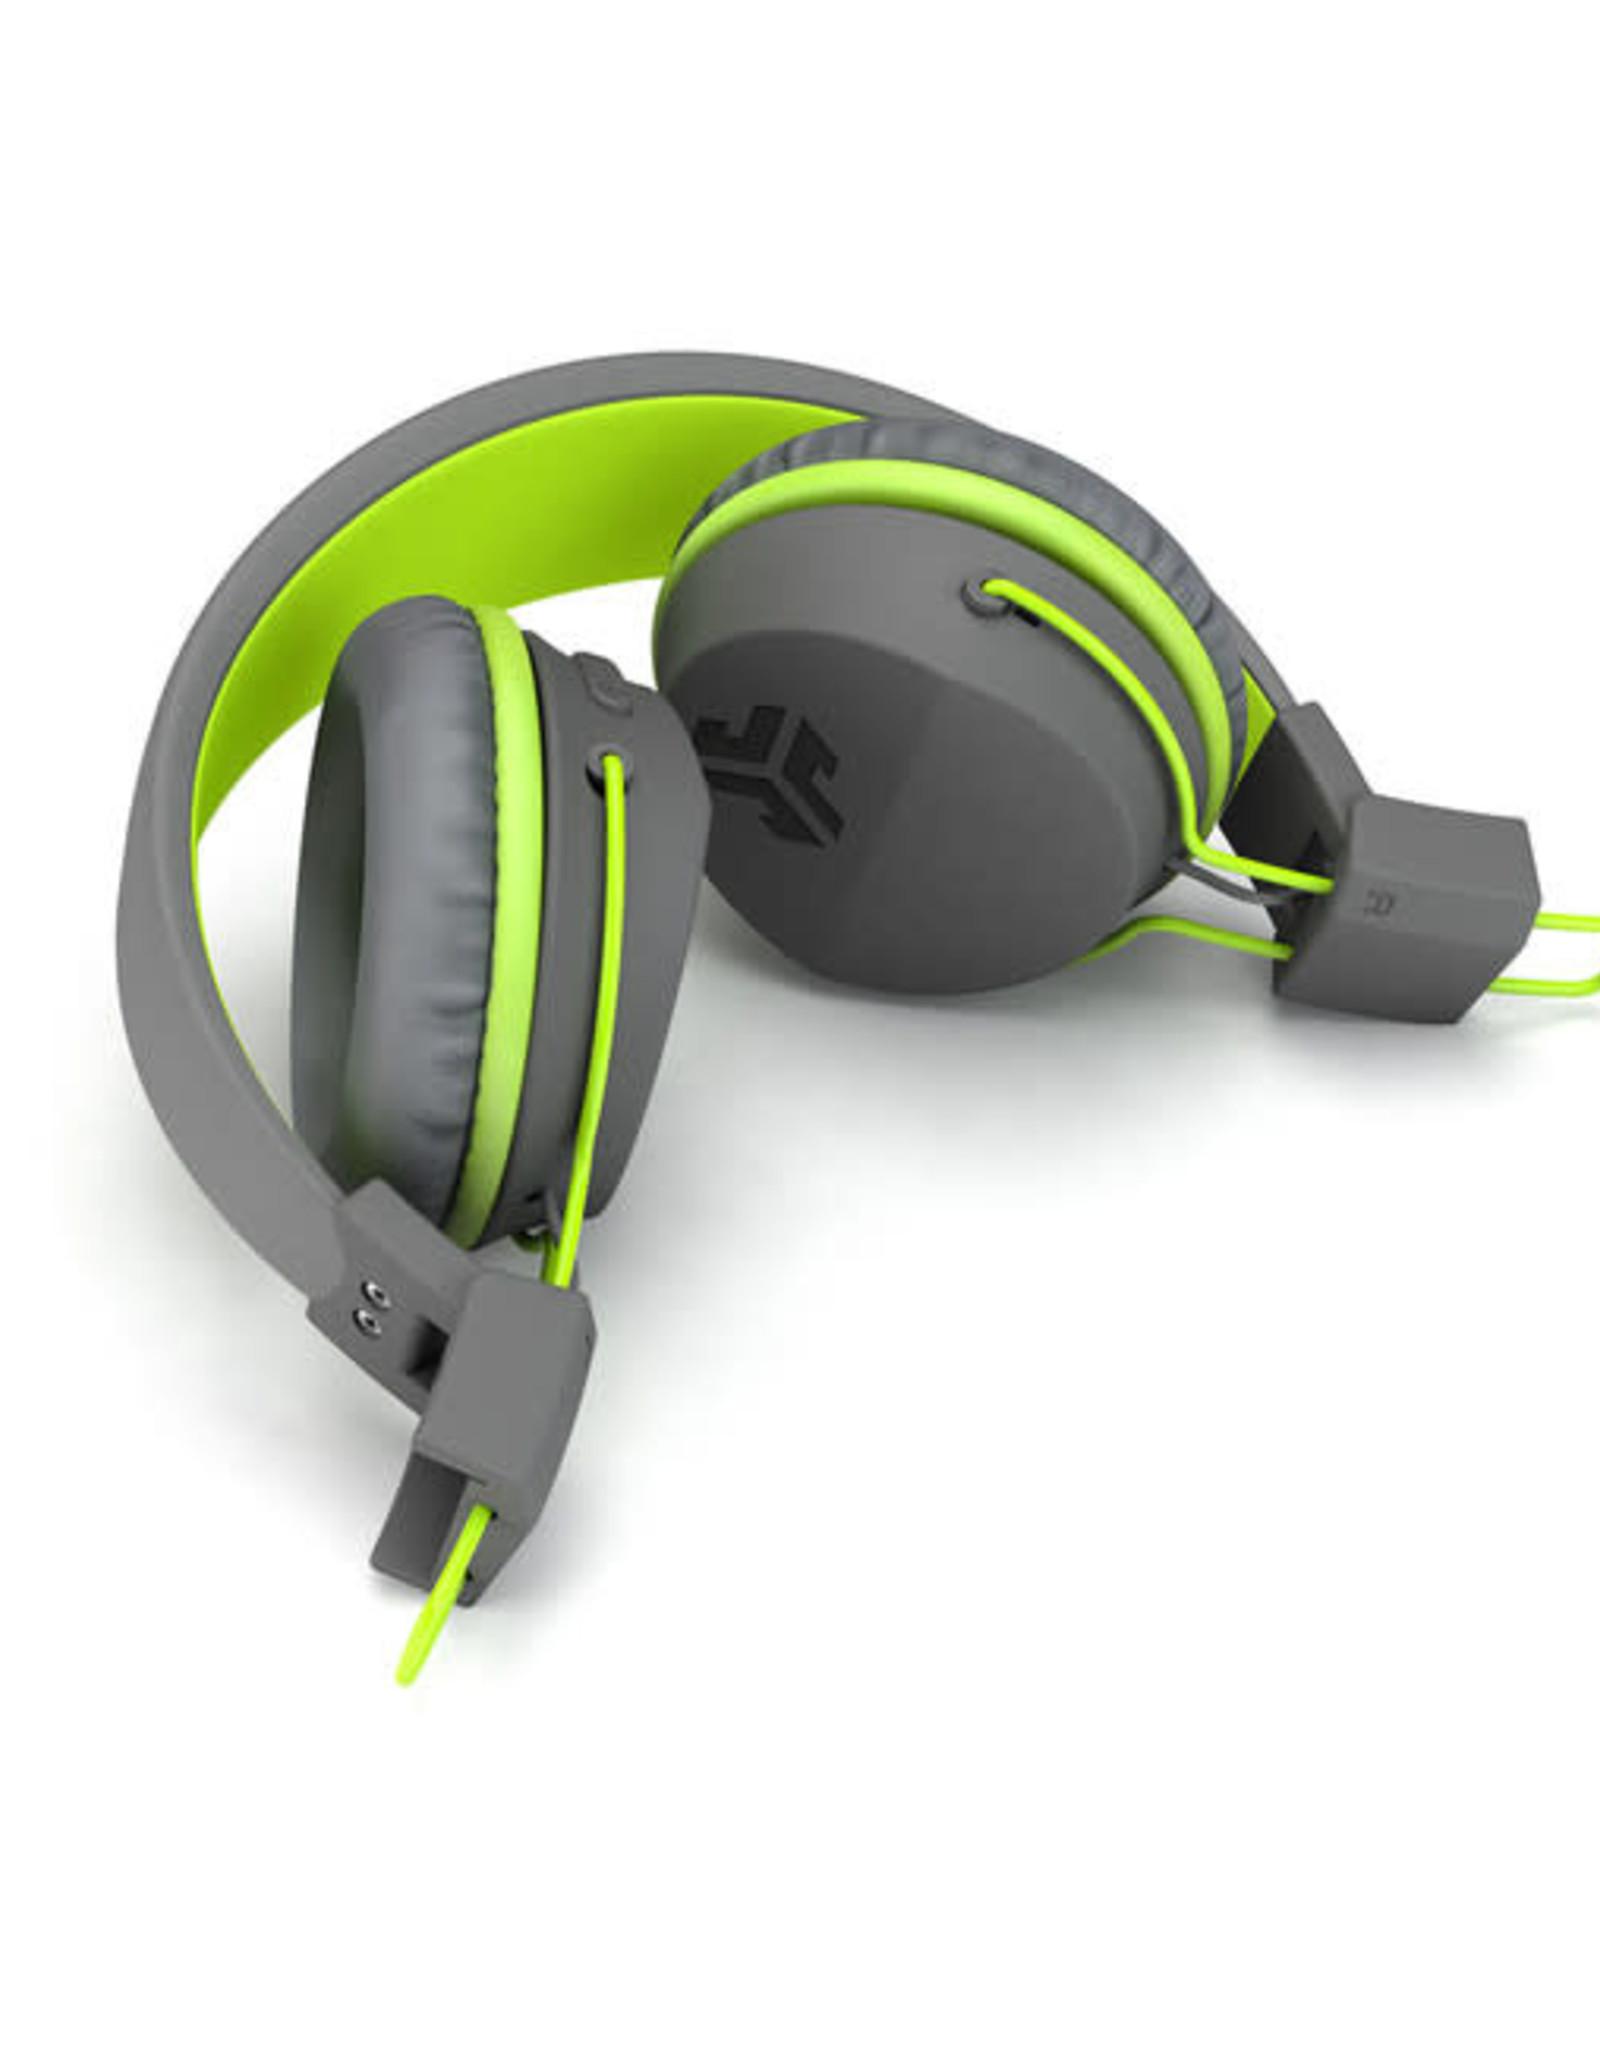 JLab Audio Neon BT Wireless On-Ear Headphones Grey/Green